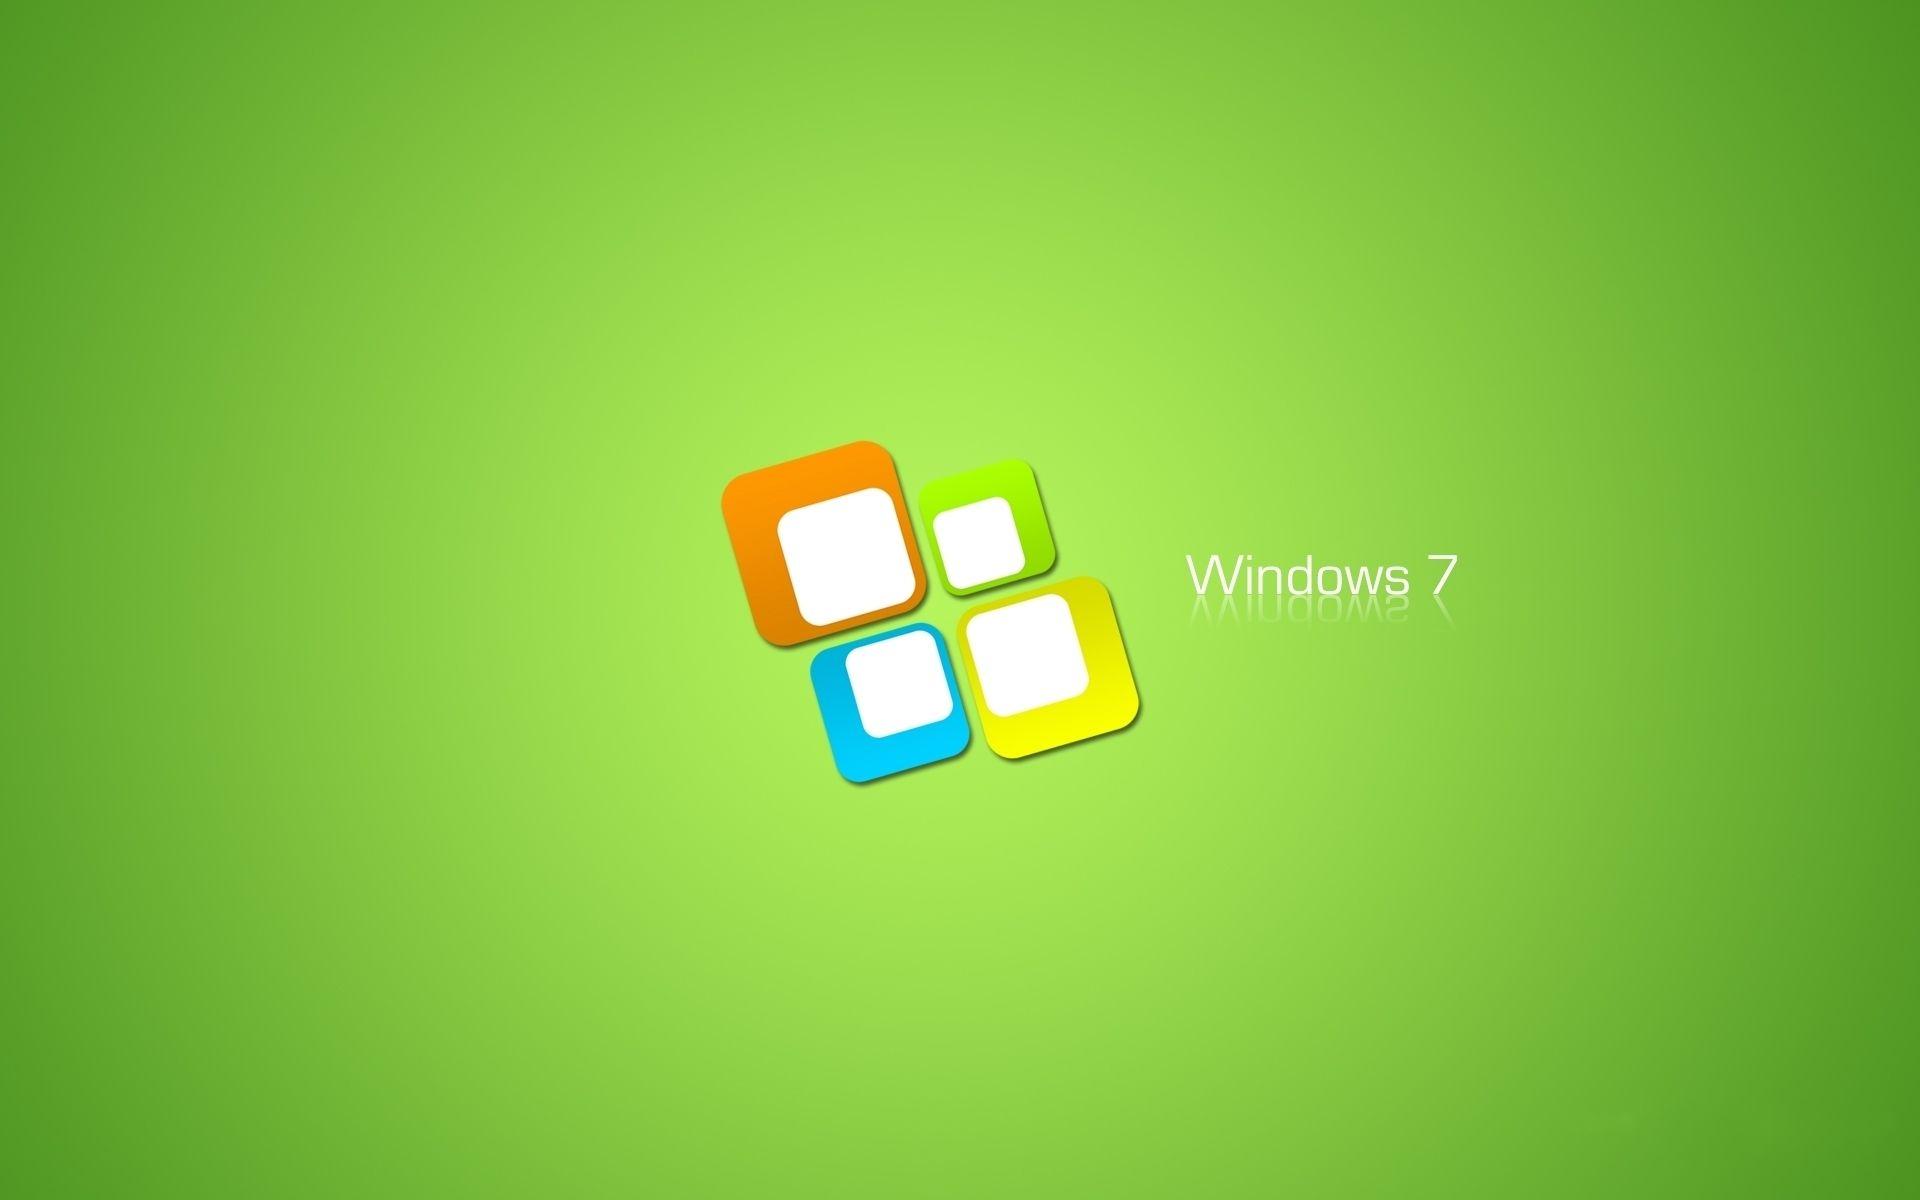 Windows vista backgrounds wallpaper hd wallpapers pinterest windows vista backgrounds wallpaper voltagebd Images